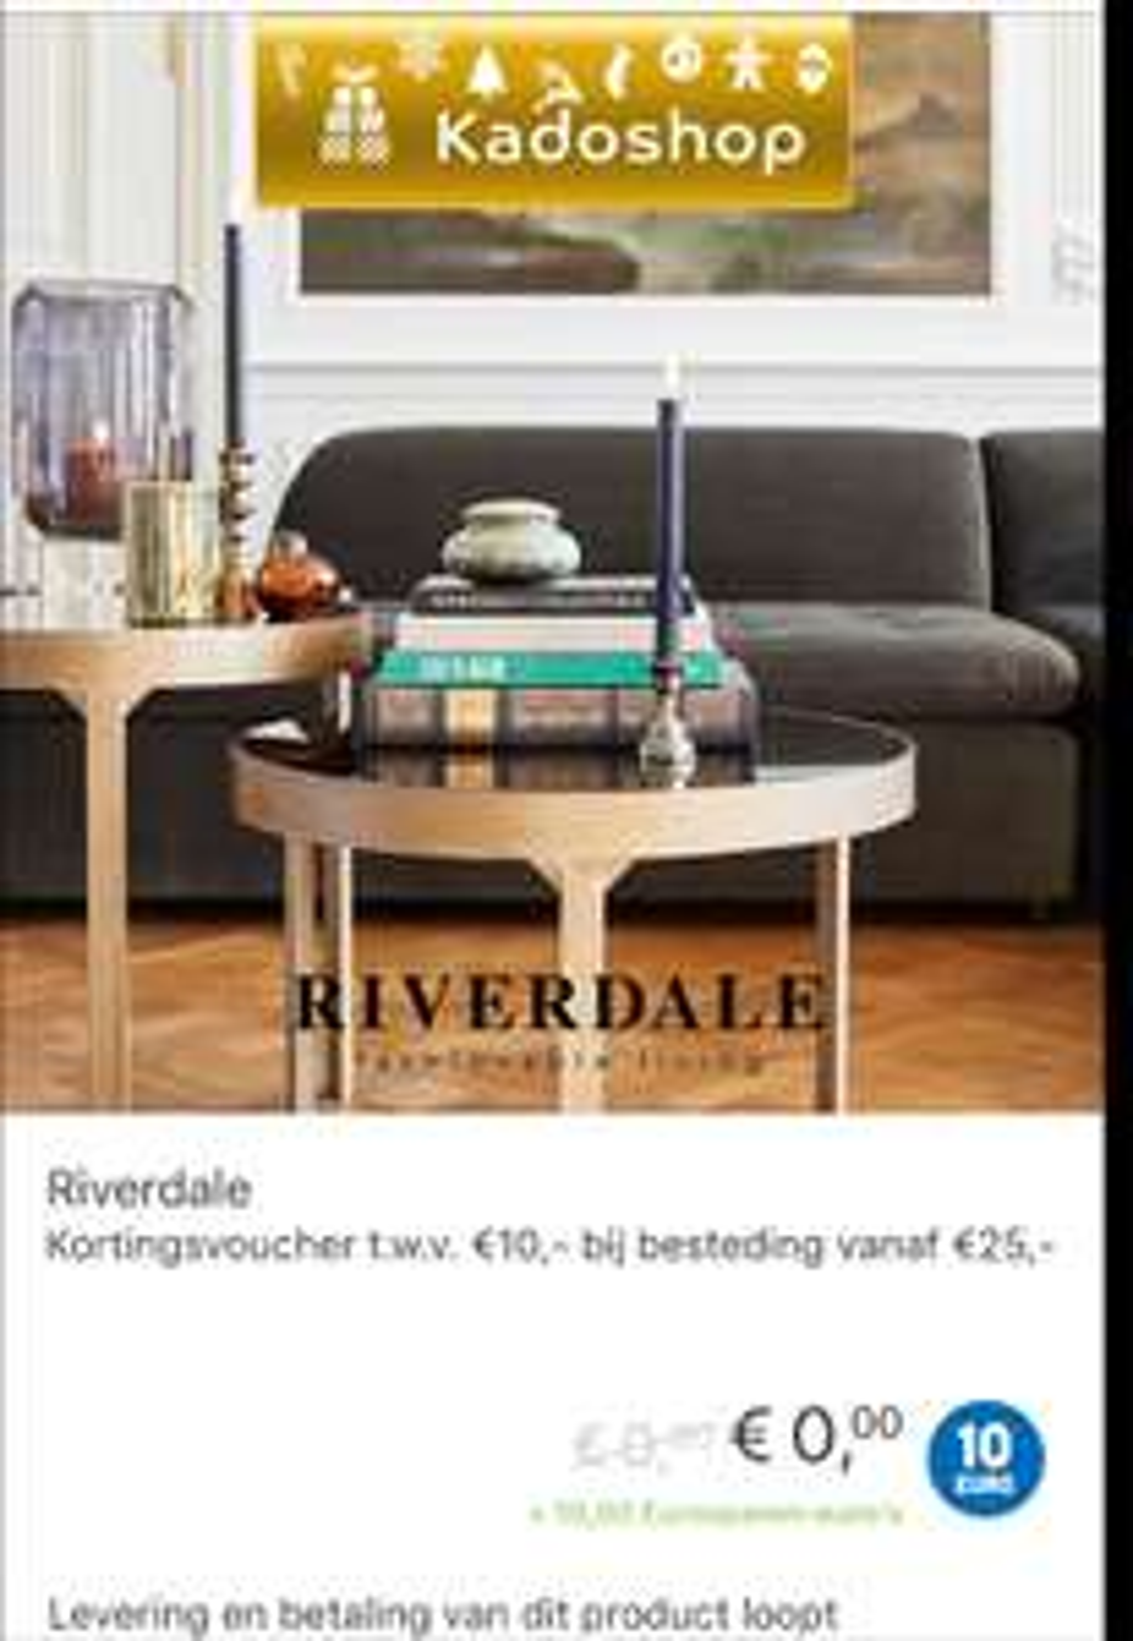 Riverdale - Kortingsvoucher t.w.v. €10,- bij besteding vanaf €25@eurosparen